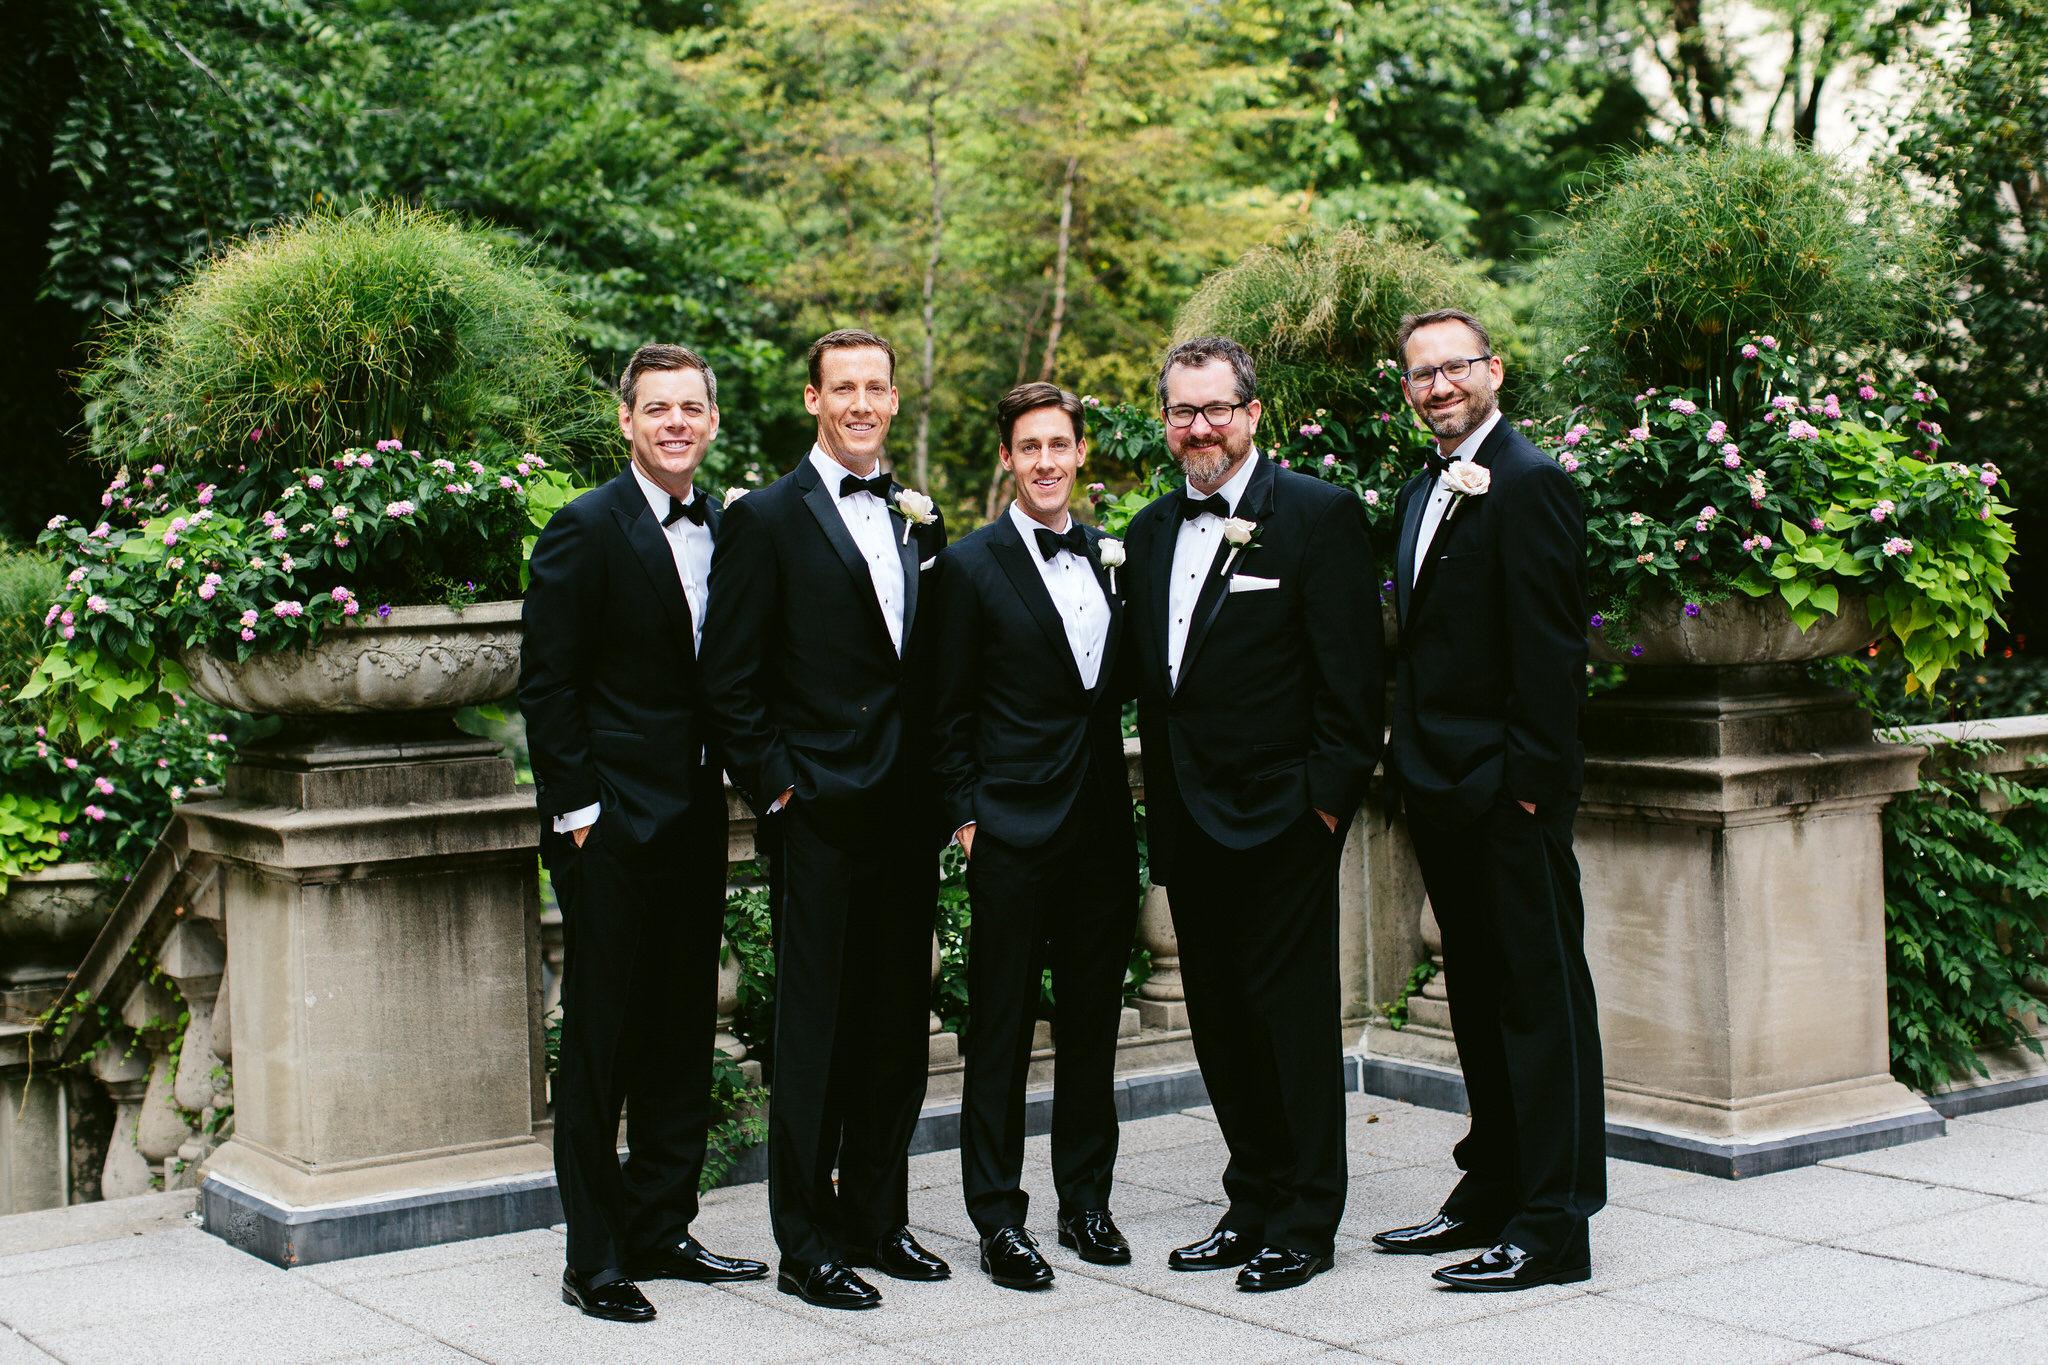 Nicodem-Creative-Chicago-Wedding-Photography-Jillian-Eric-River-